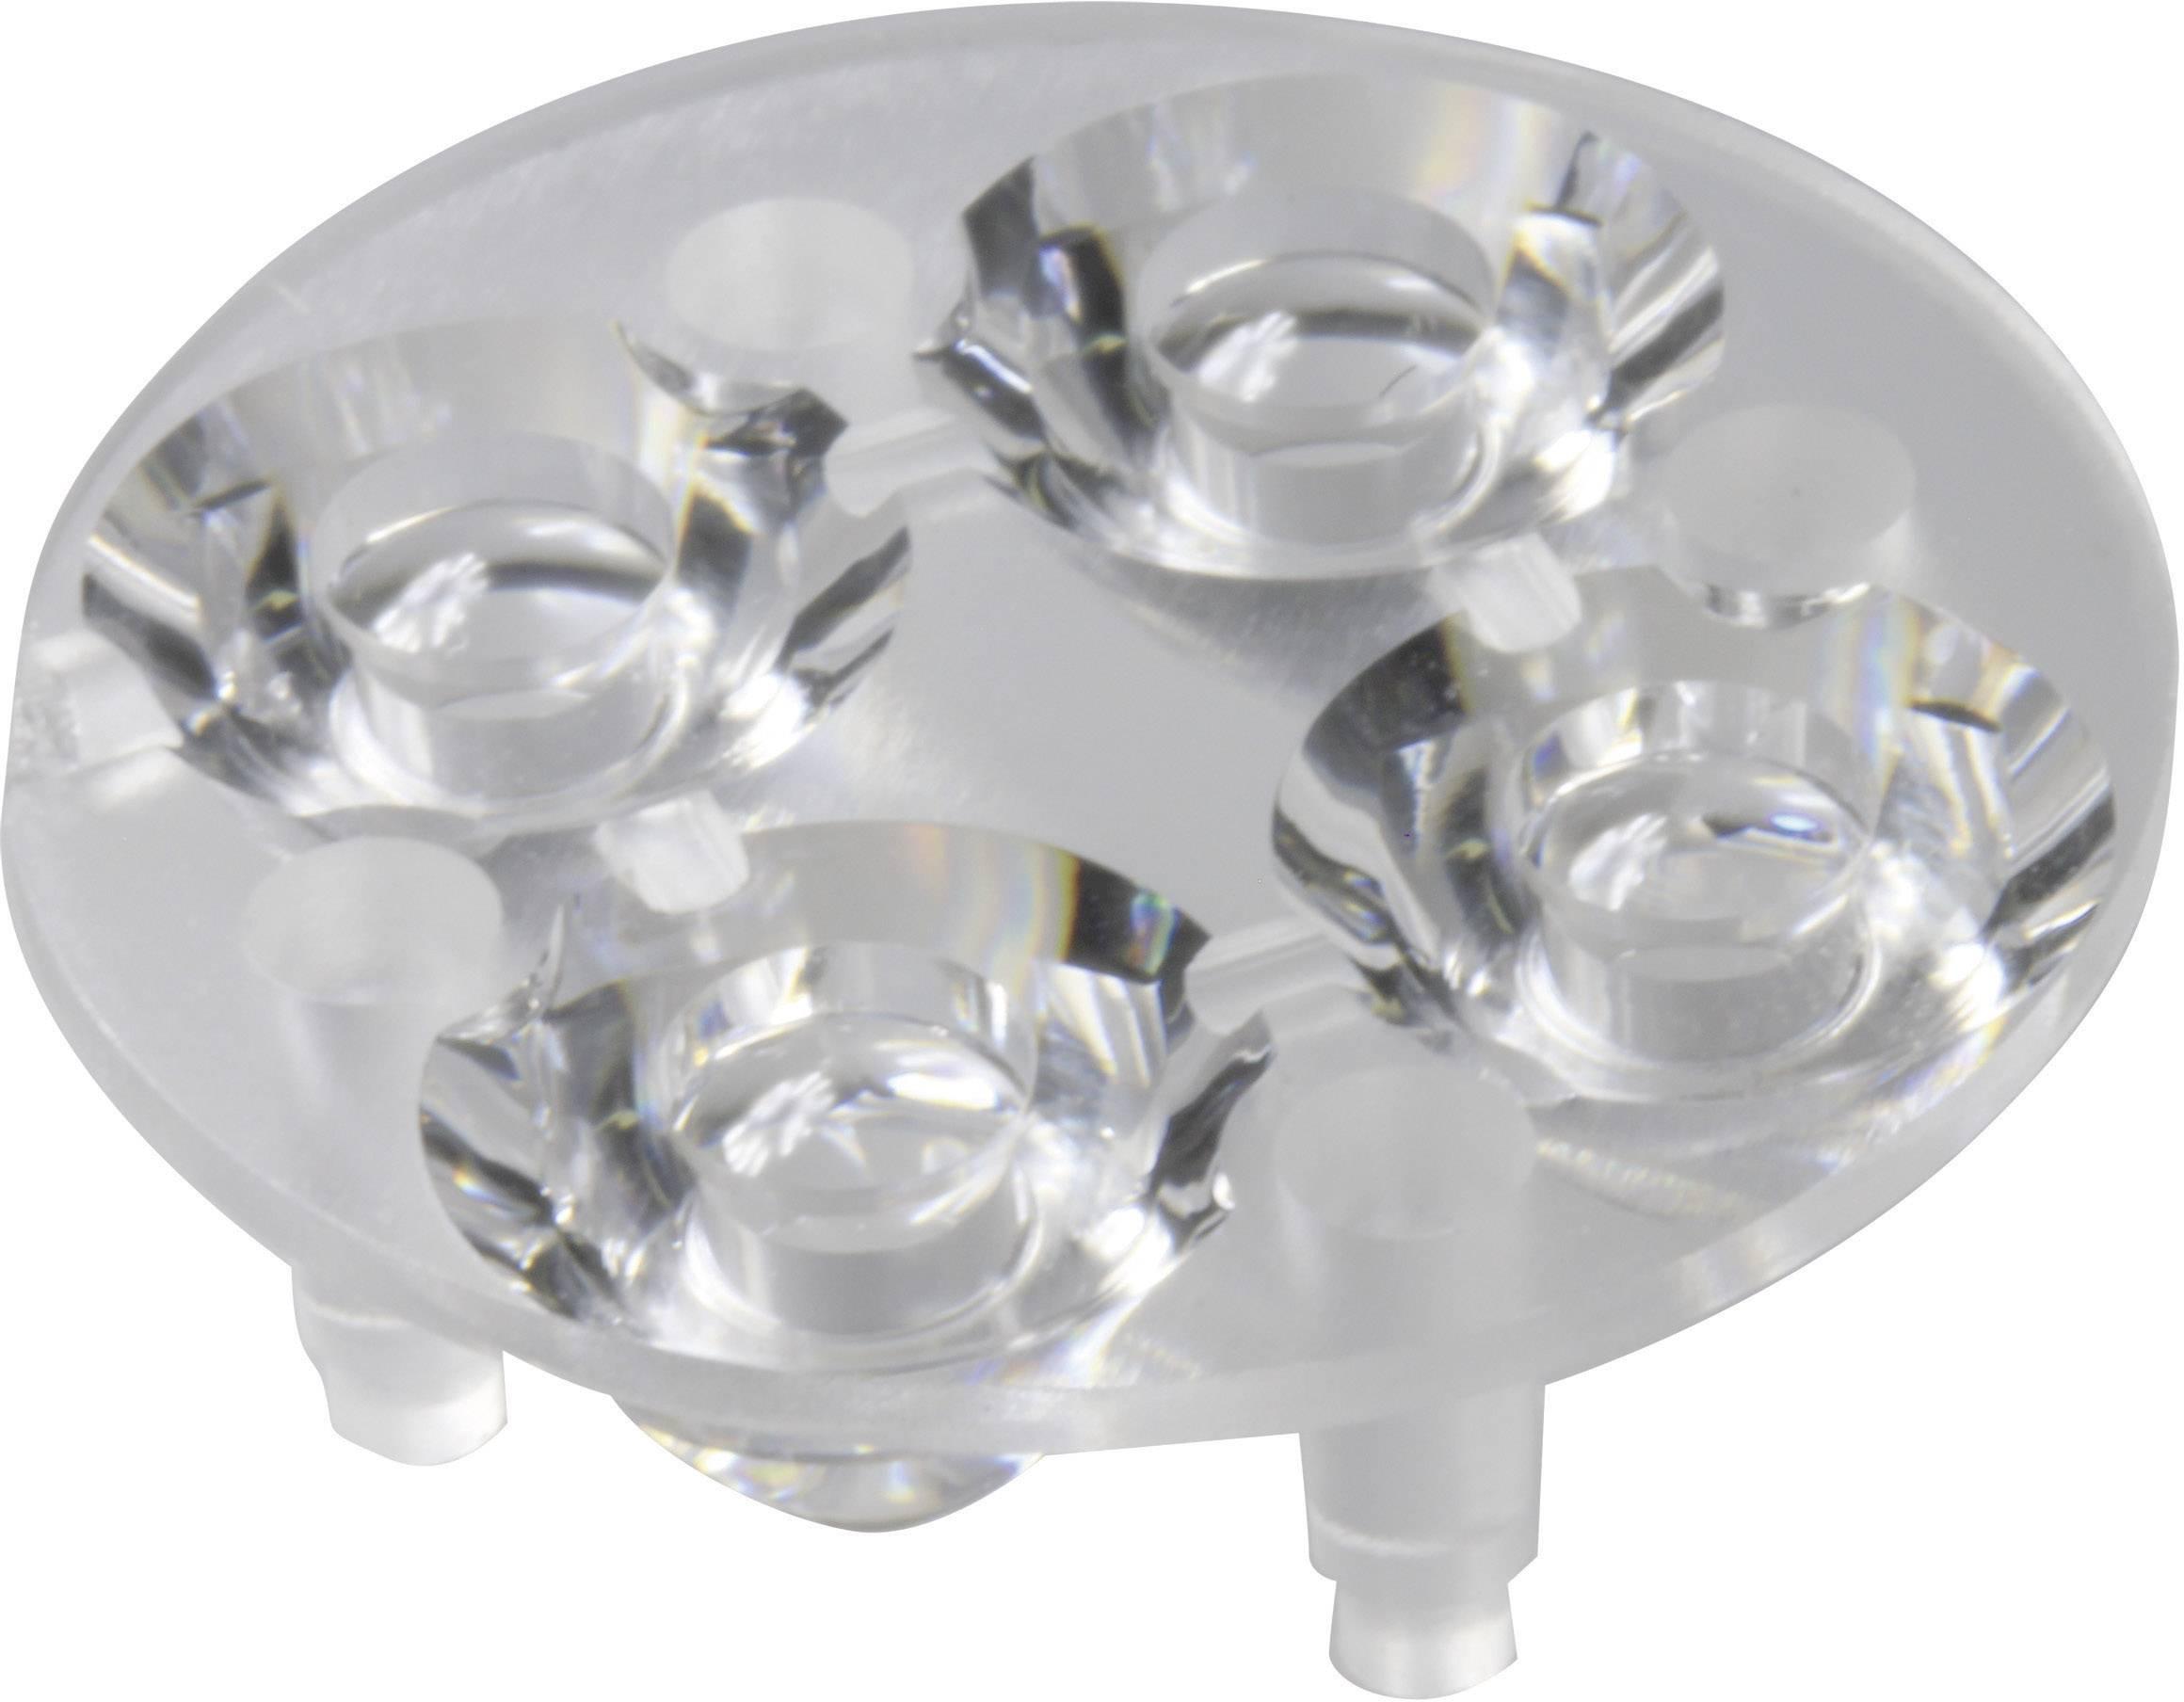 Optika pro Luxeon ® Rebel nebo Seoul Semiconductor ® Z5 Carclo 10621, 16.4°